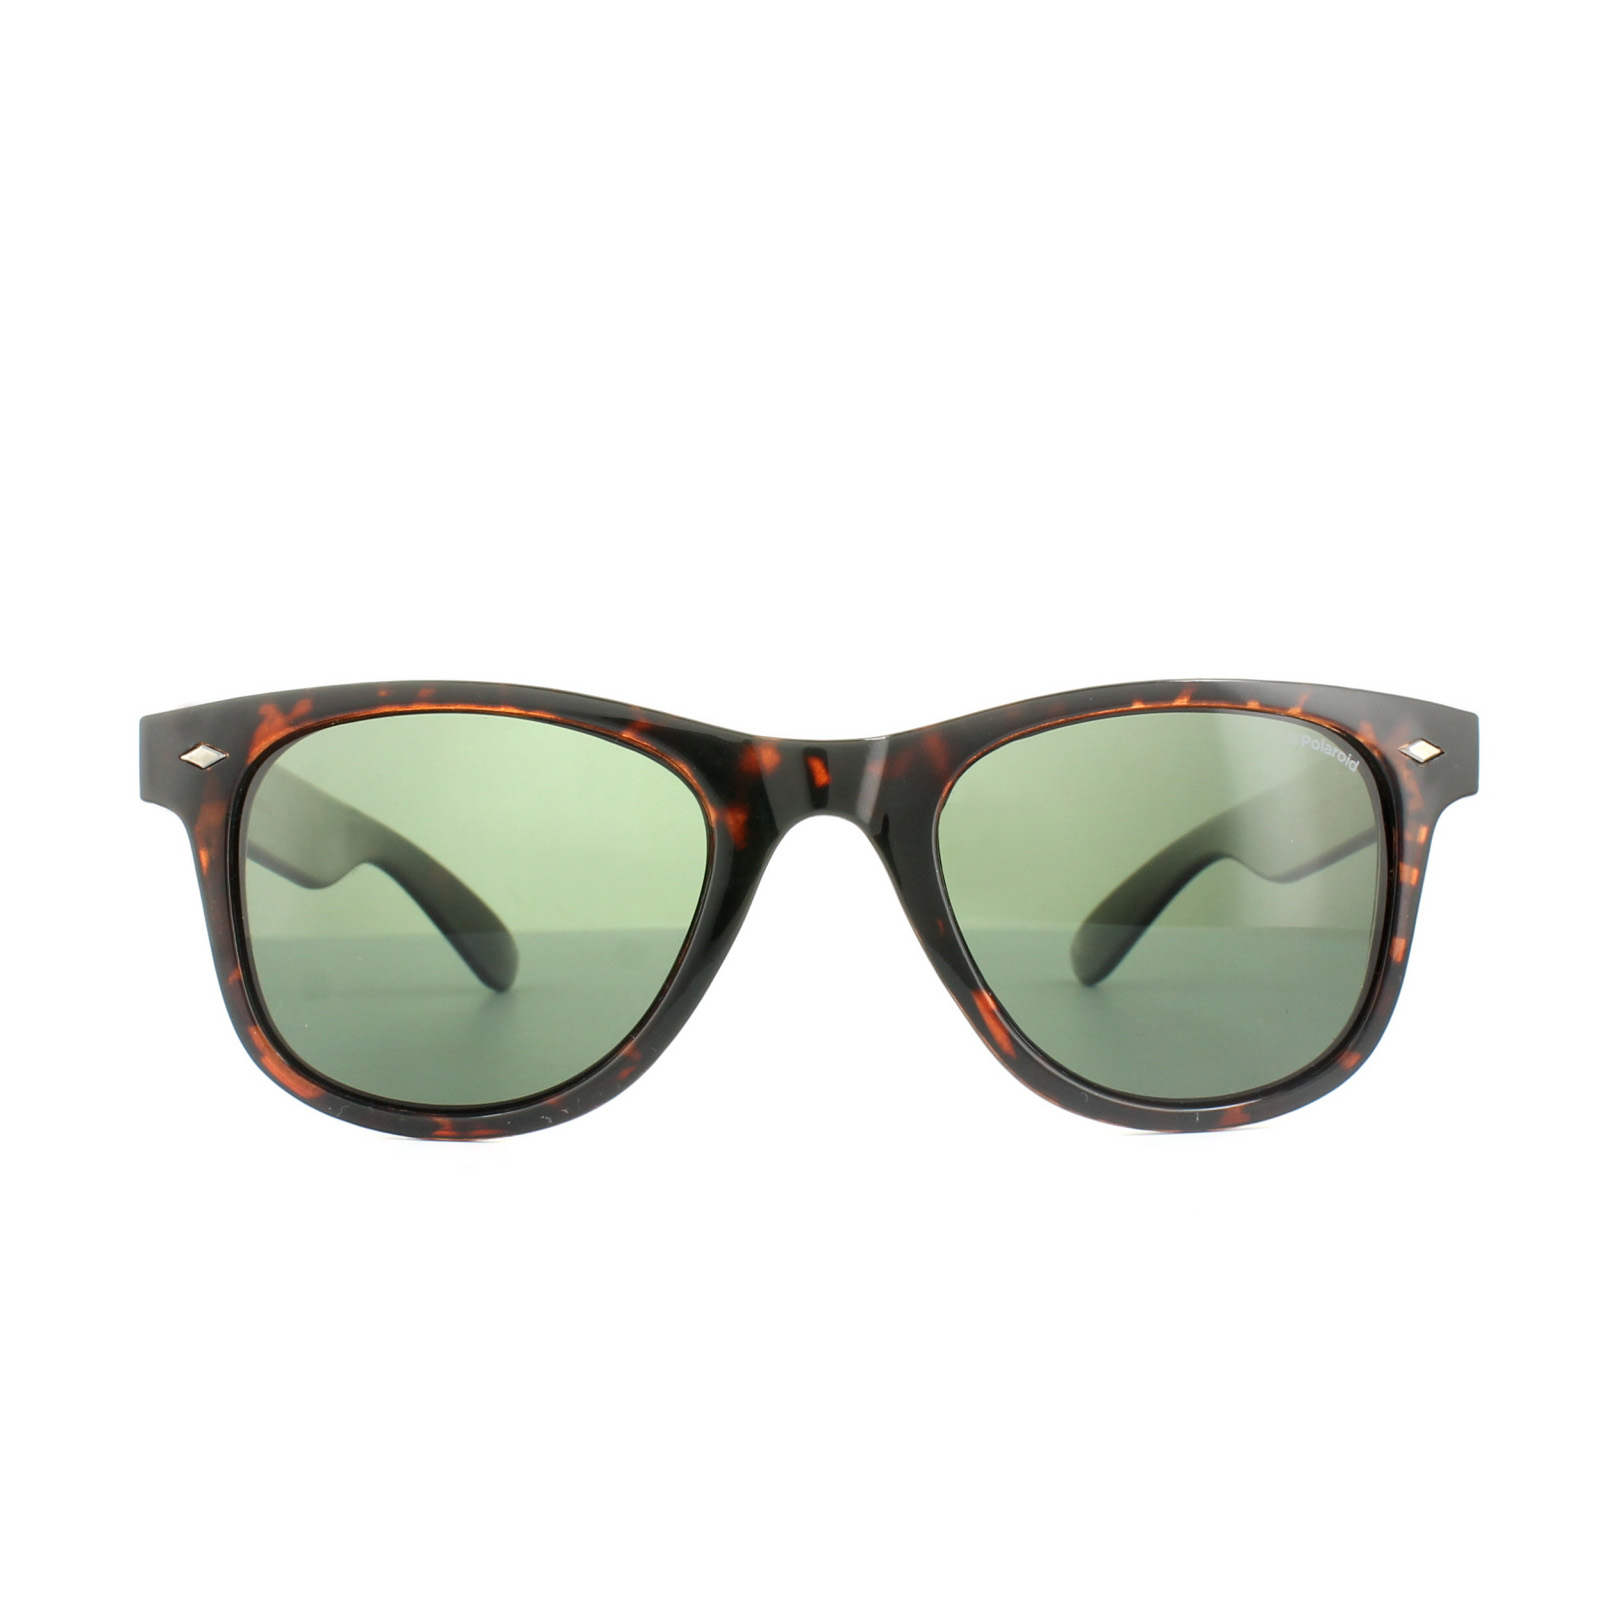 Polaroid Sonnenbrille (PLD 1016/S V08/H8 50) Mi2Yx9Ht